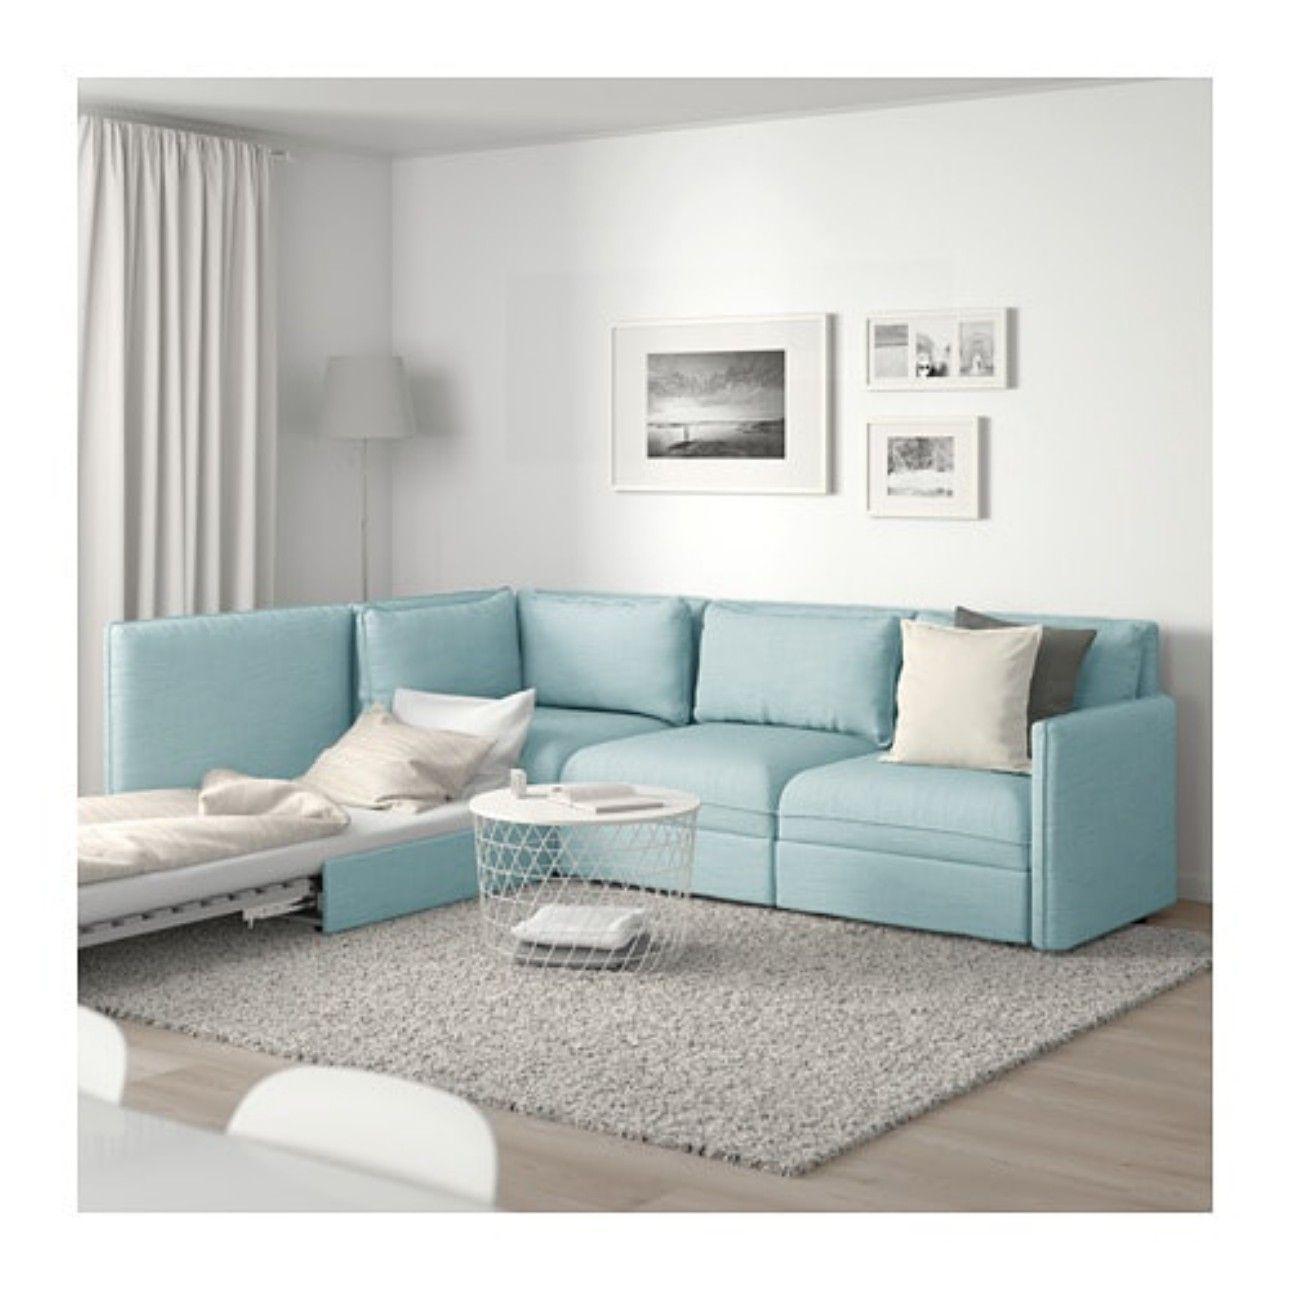 For the guest room/craft room Modular corner sofa, Ikea